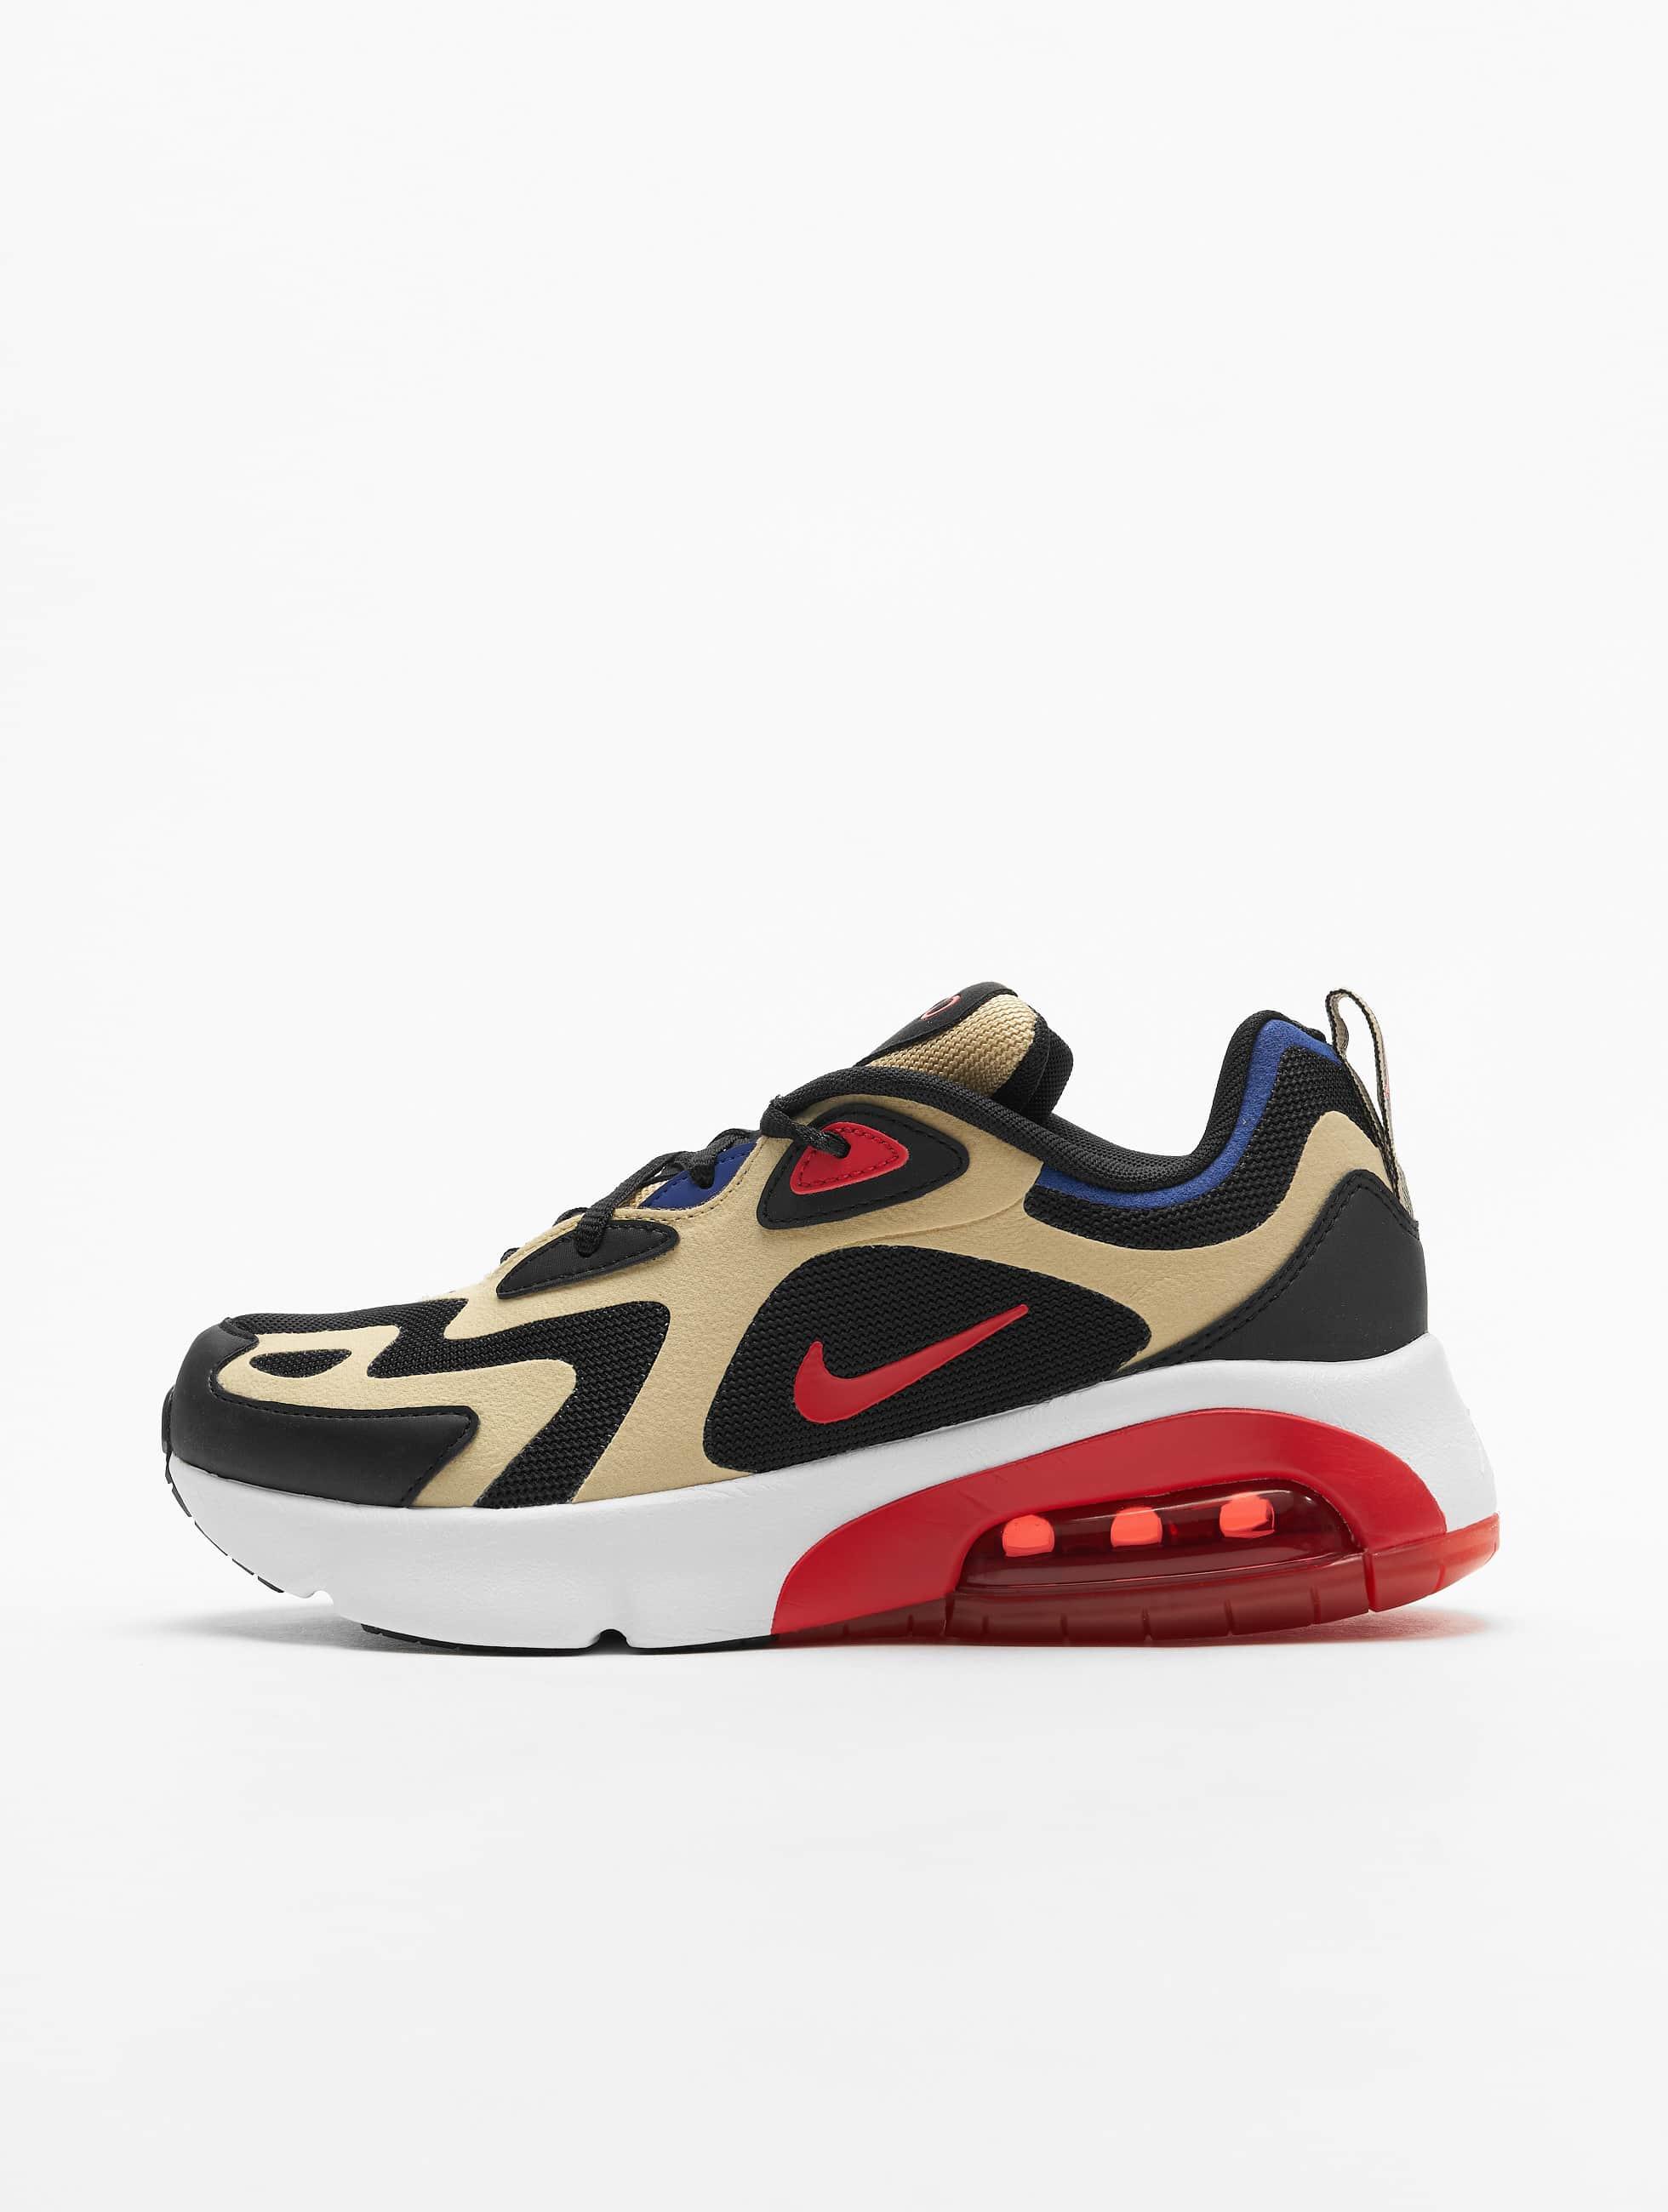 Nike Air Max 200 (GS) Sneakers Team GoldenUniversity RedBlackWhite